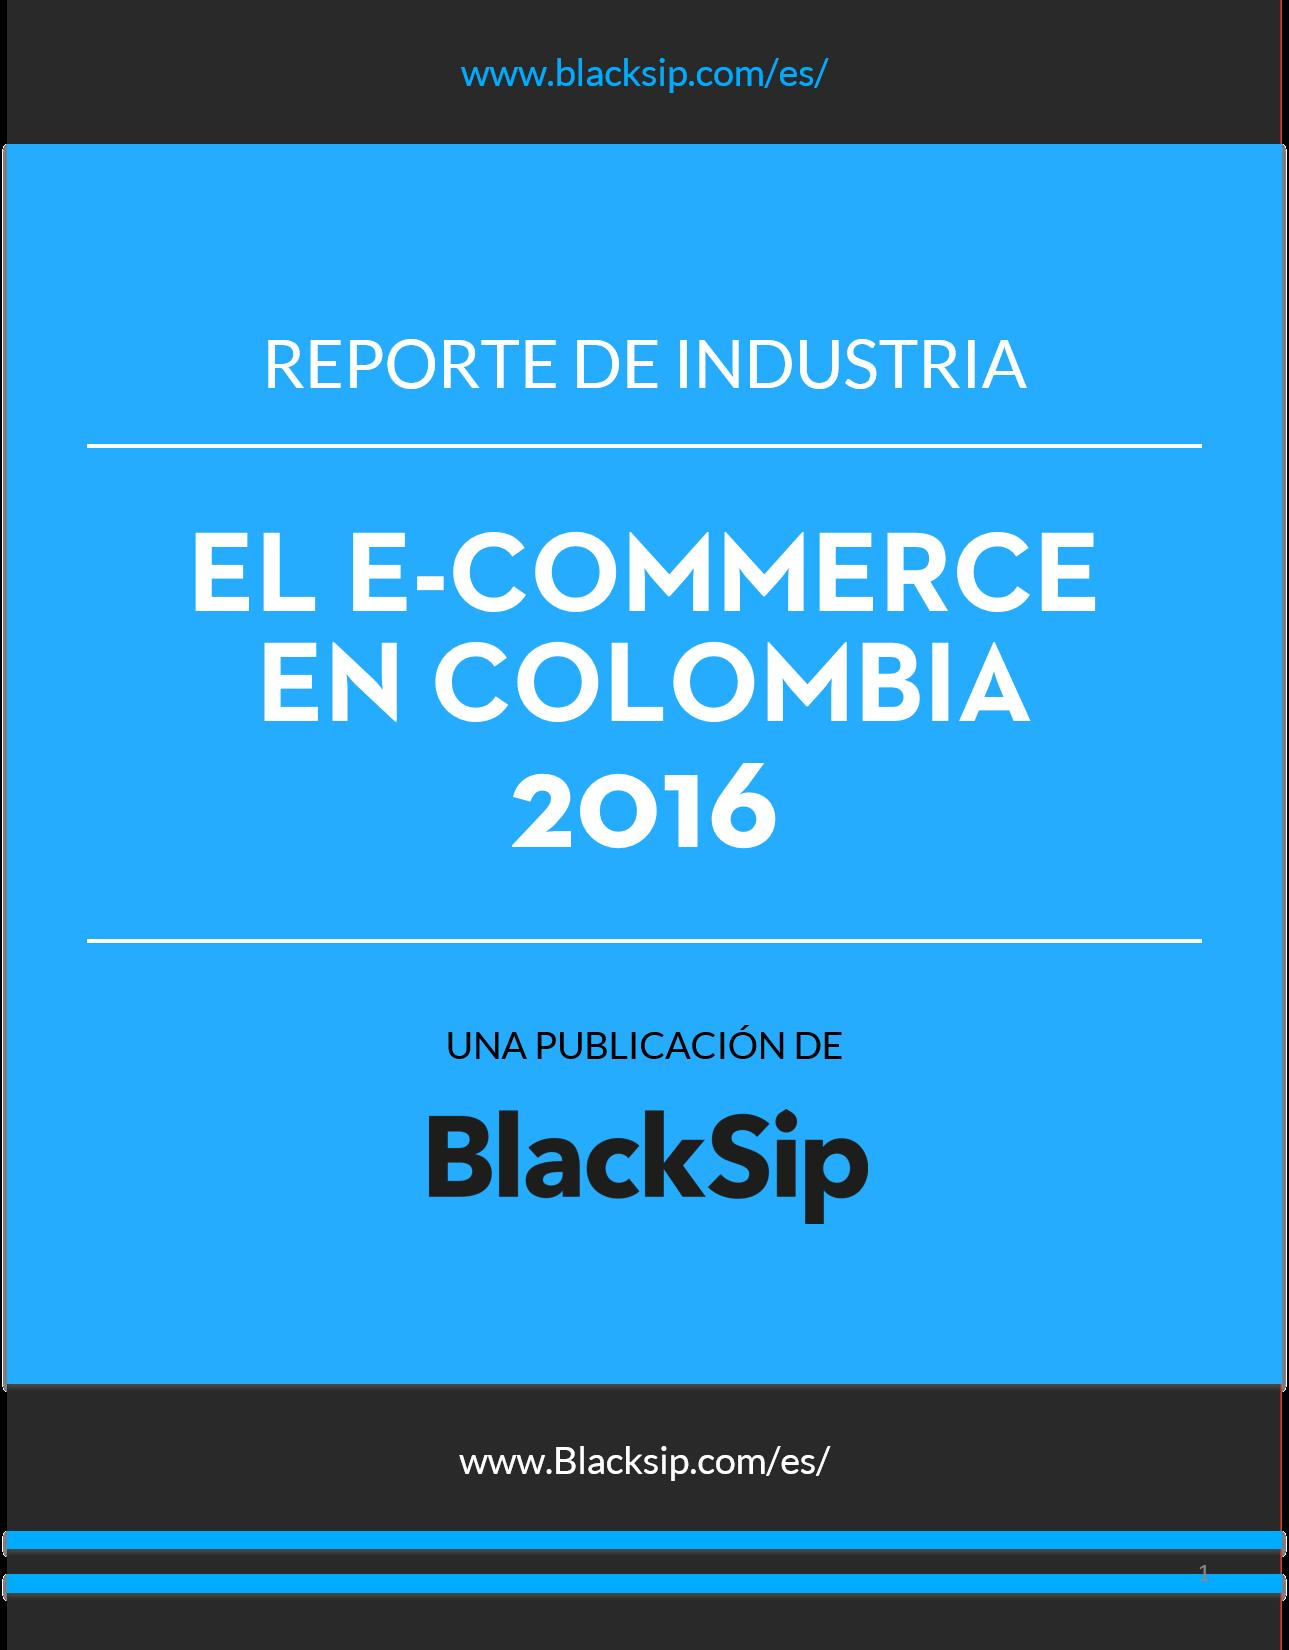 Reporte_de_industria_-_El_Ecommerce_en_Colombia_2016.png